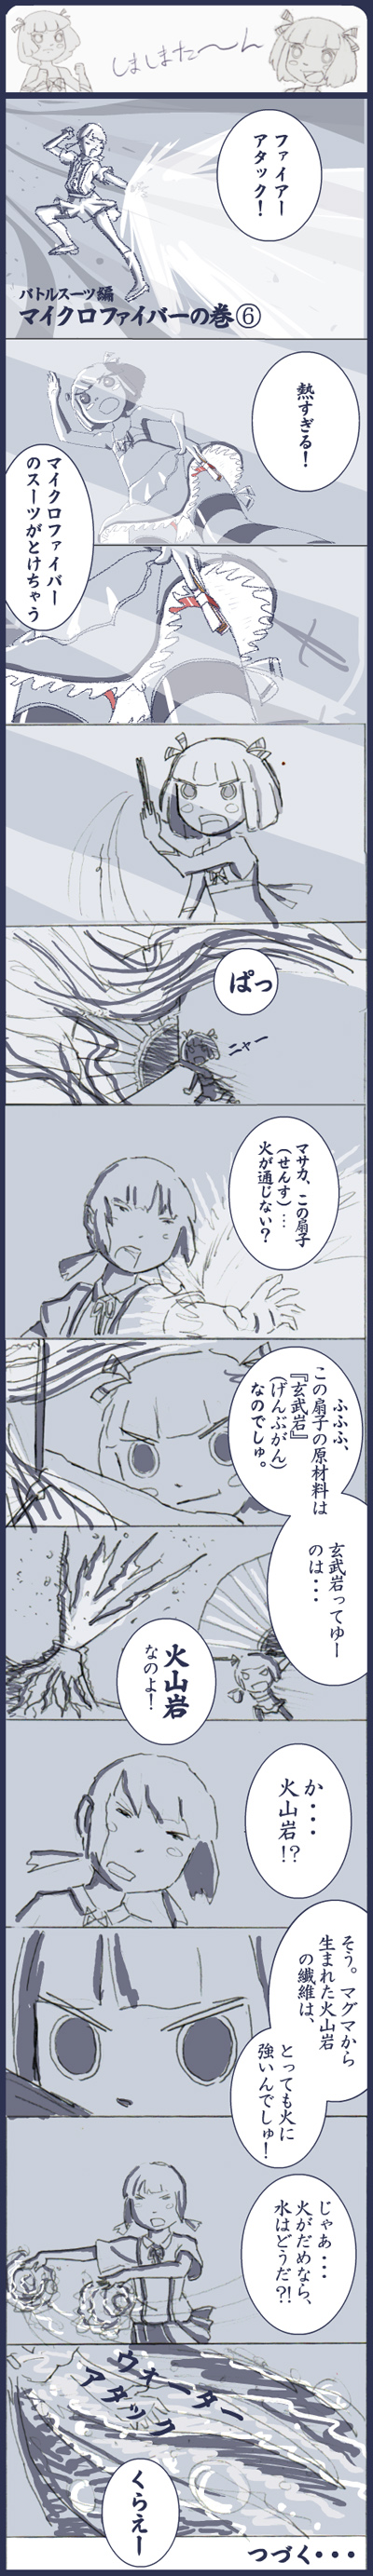 shimatan_06.jpg